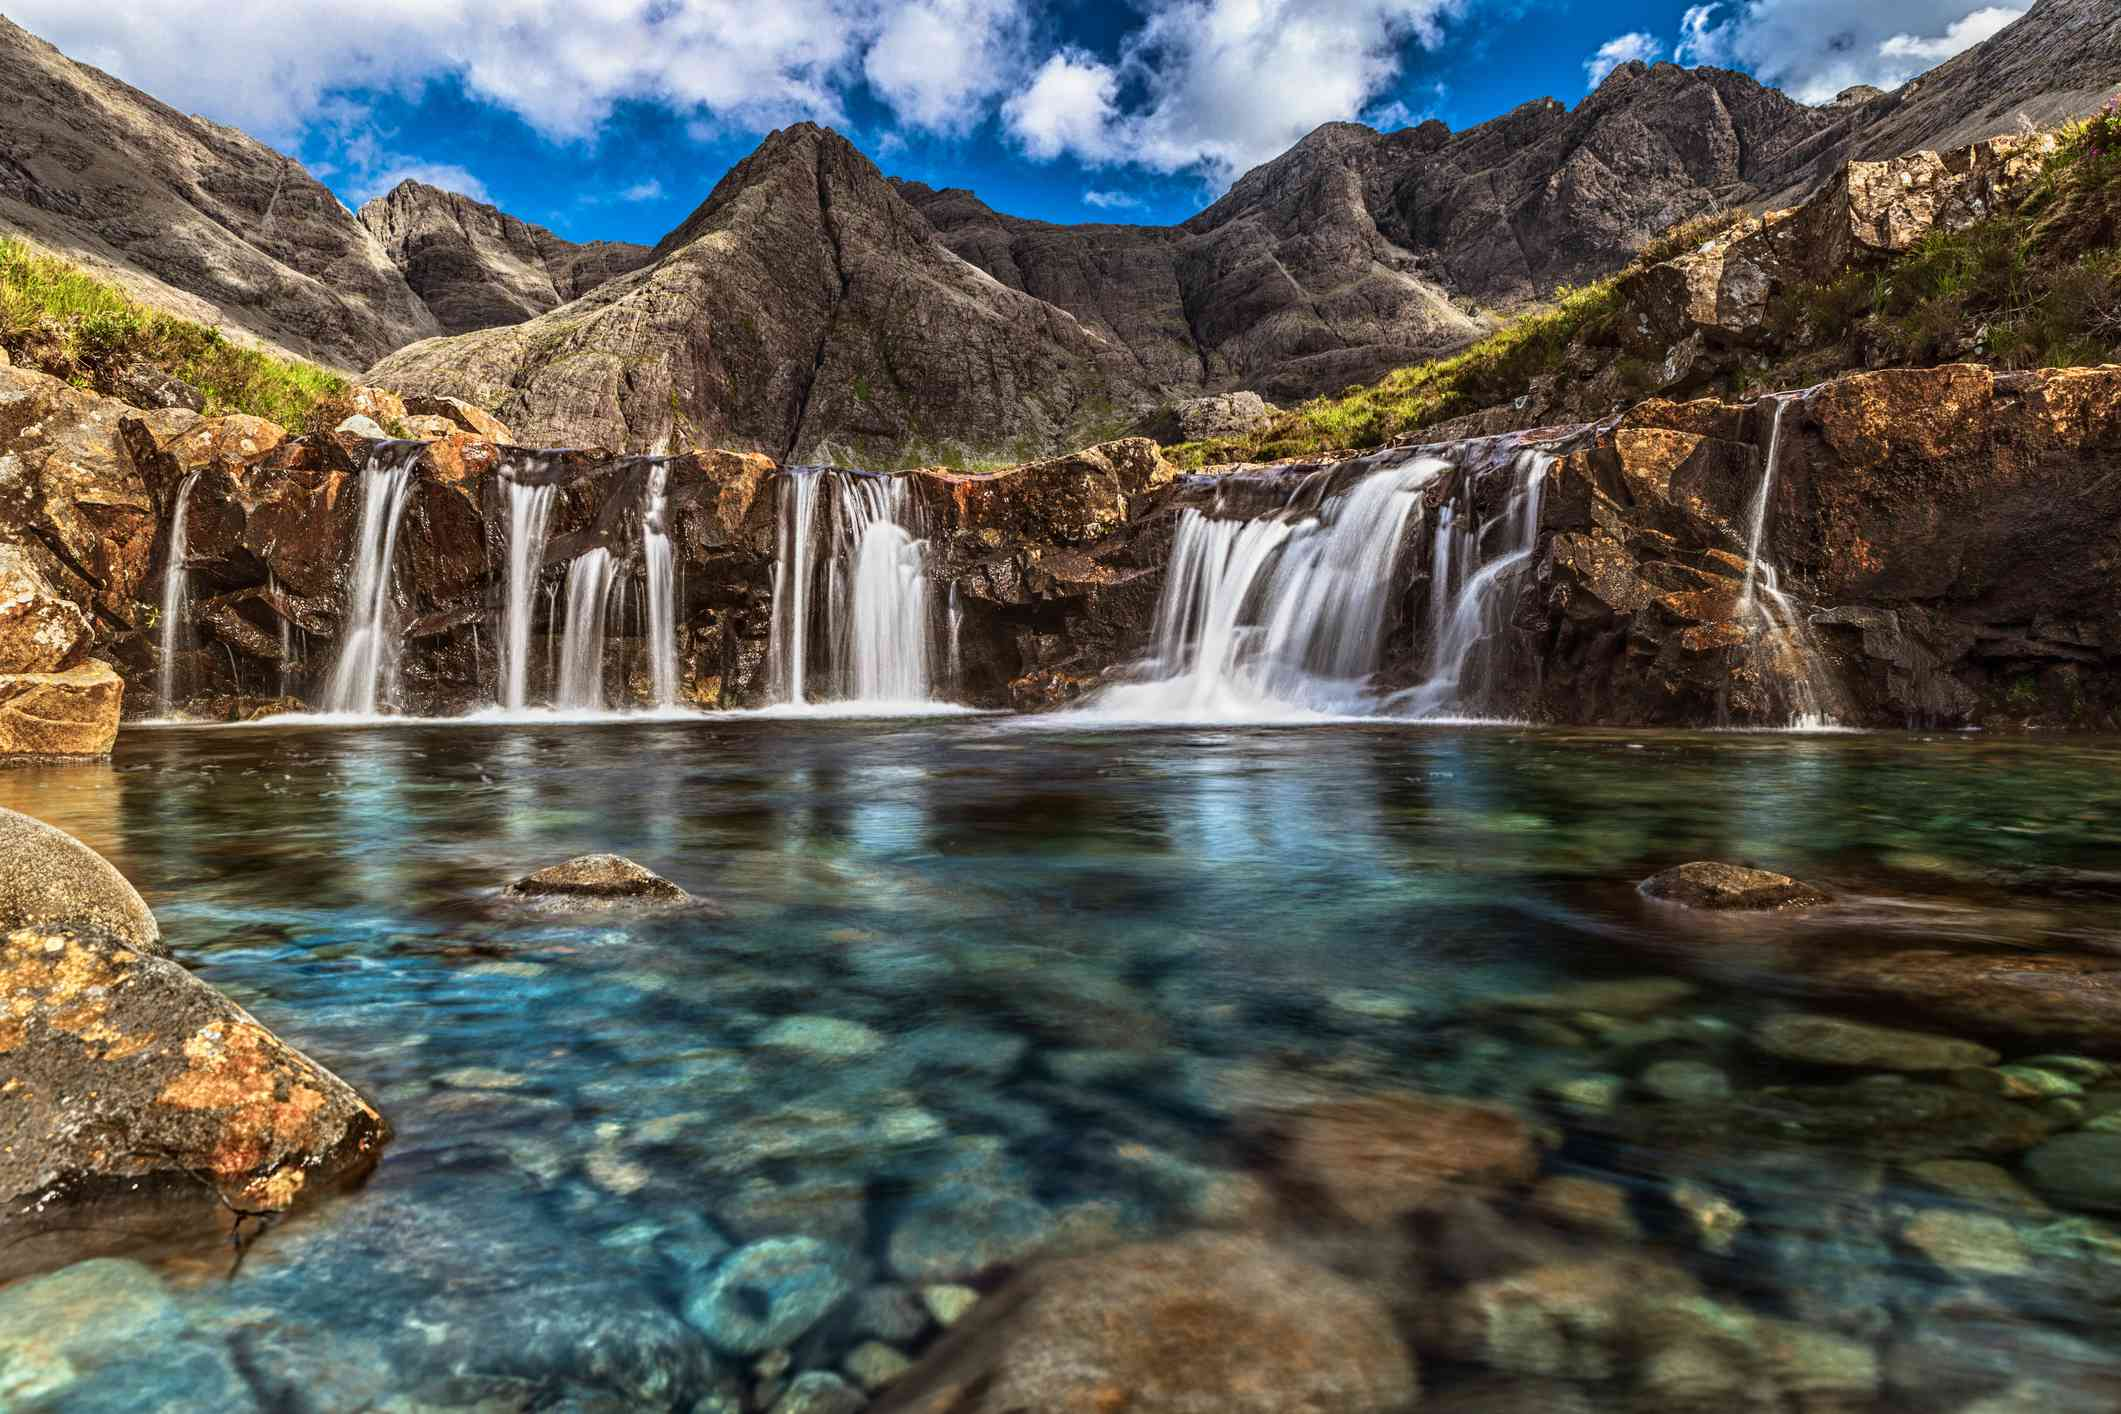 The Fairy Pools Isle of Skye